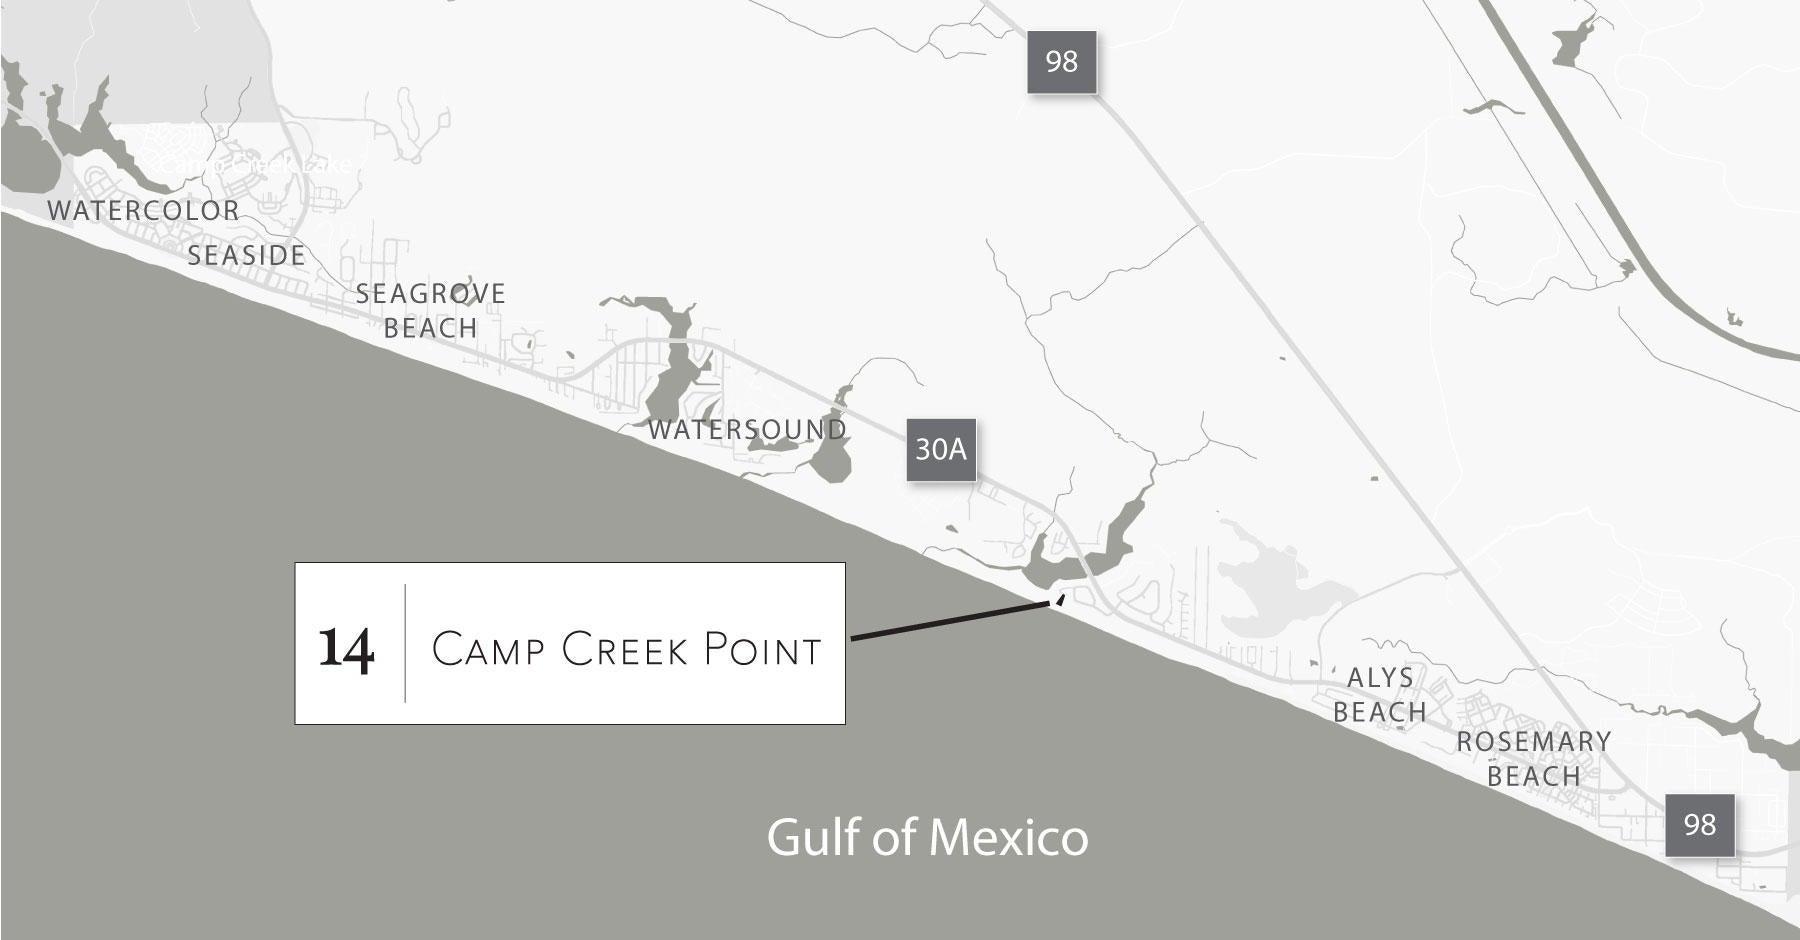 14 Camp Creek Point,Santa Rosa Beach,Florida 32459,6 Bedrooms Bedrooms,8 BathroomsBathrooms,Detached single family,Camp Creek Point,20131126143817002353000000